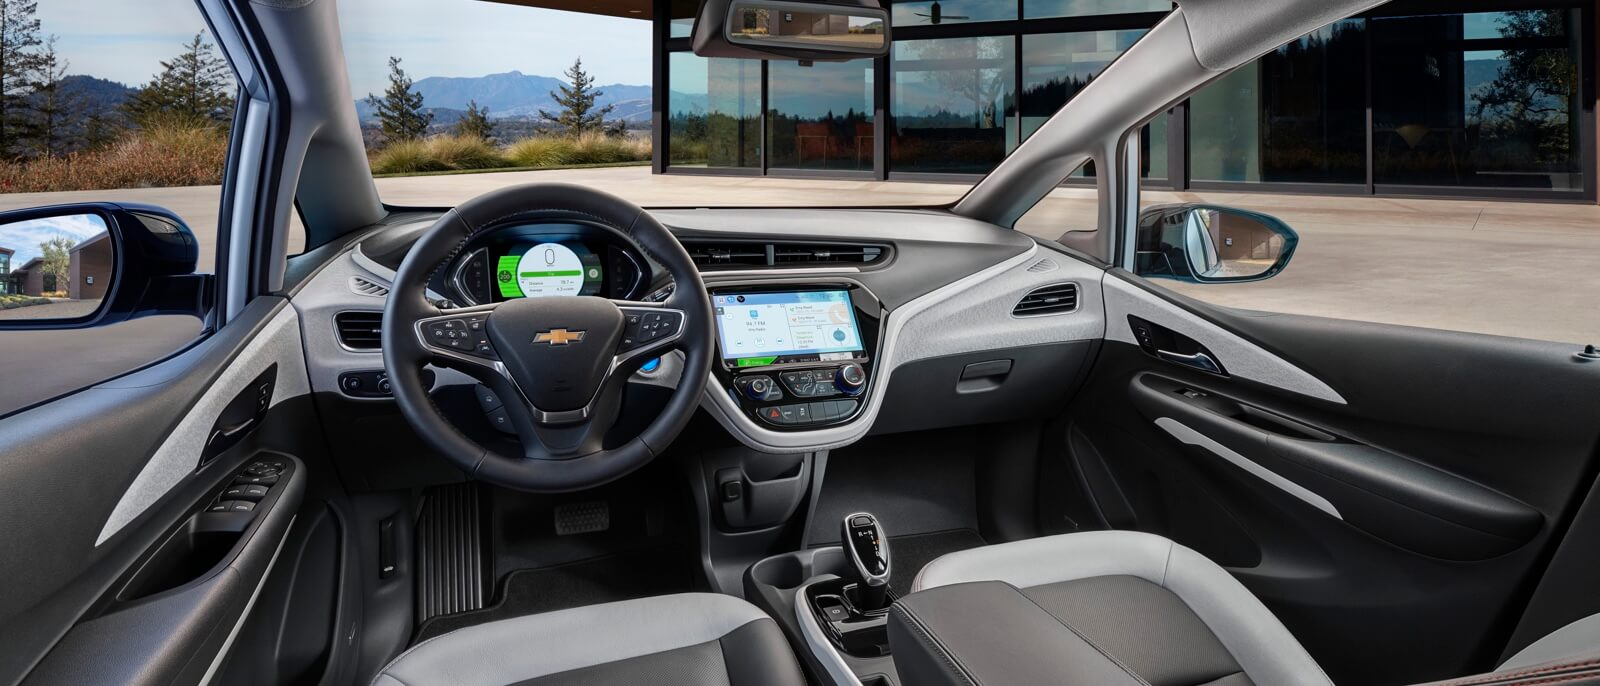 2017 Chevrolet Bolt EV front interior